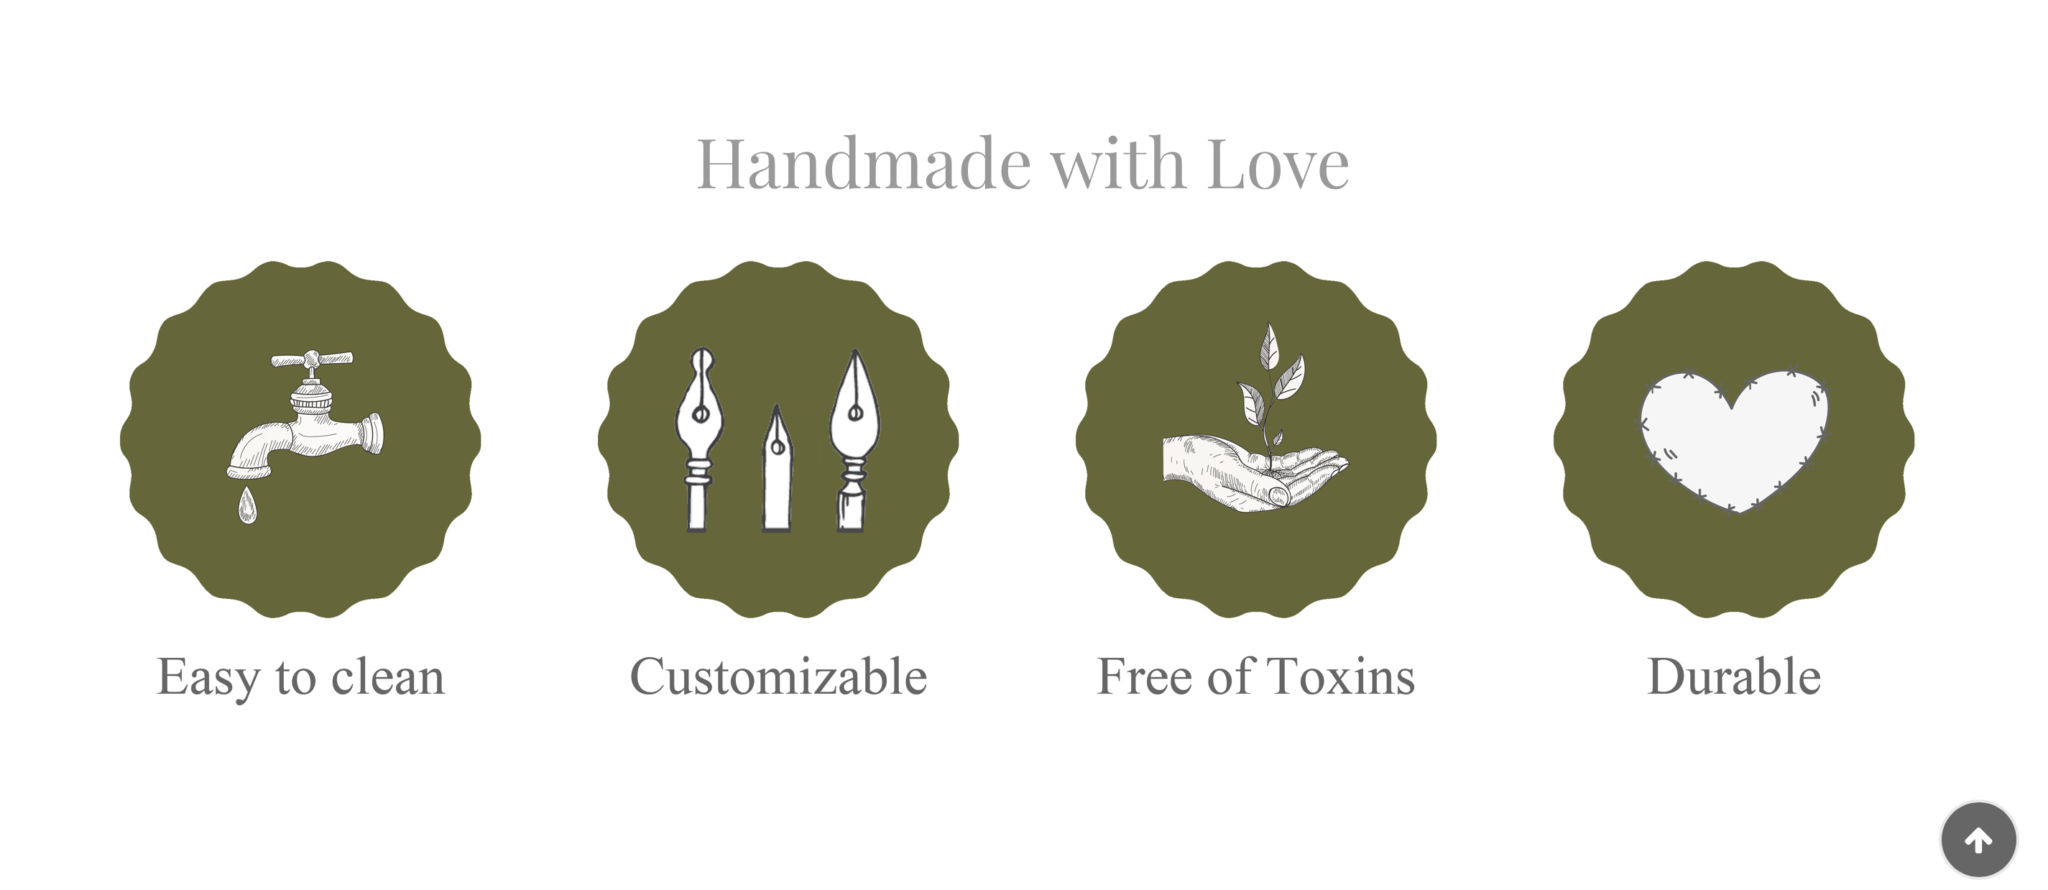 handmade with love icons